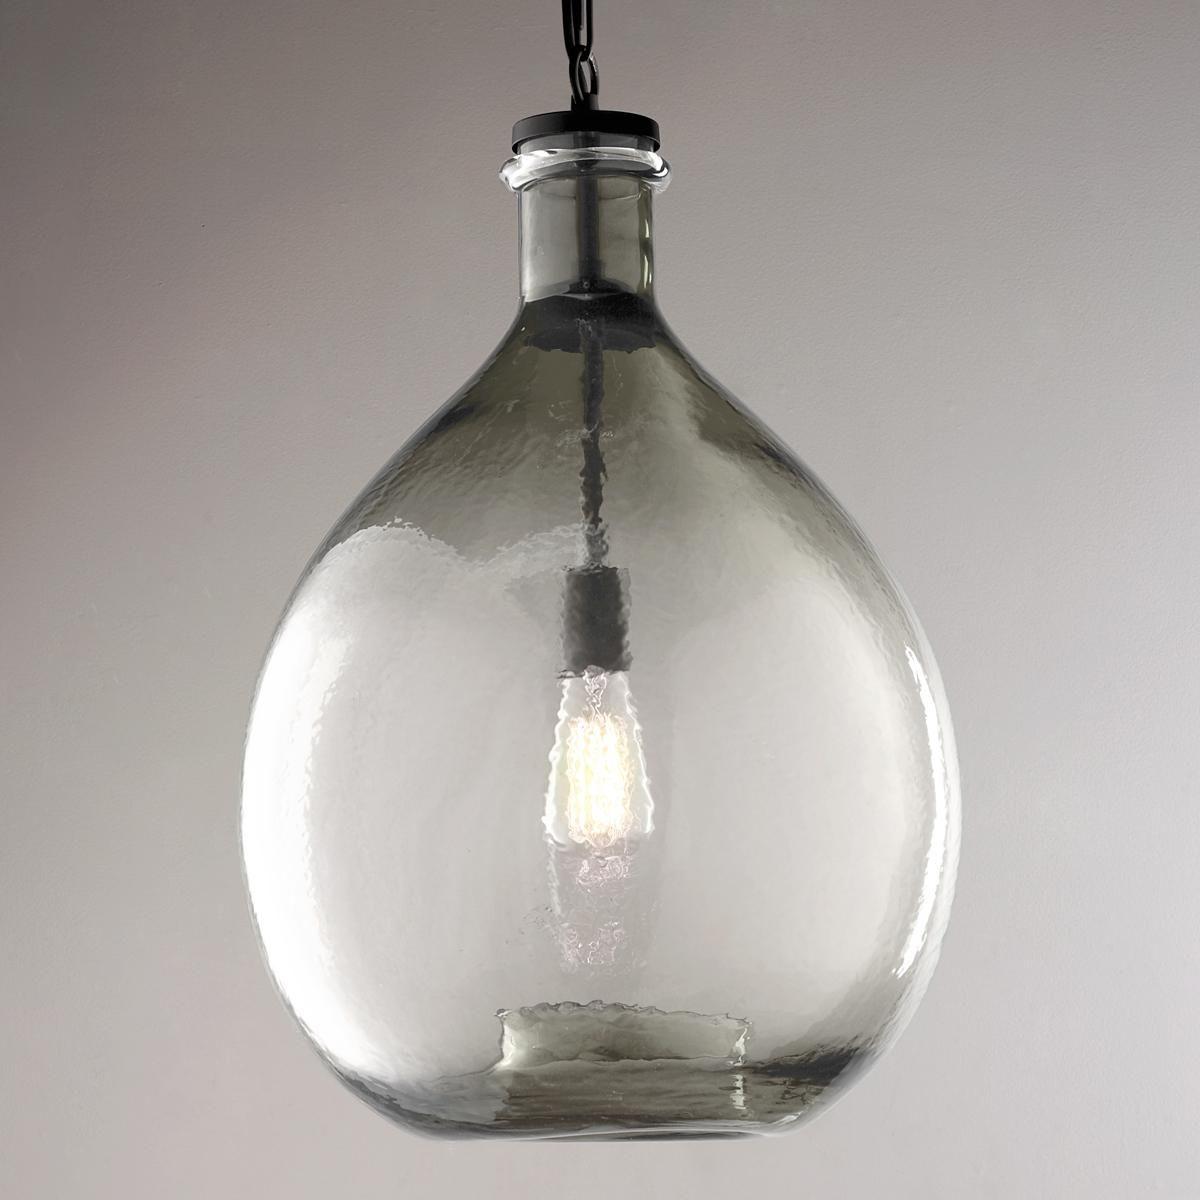 Oversized Glass Jug Pendant Glass Pendant Light Large Glass